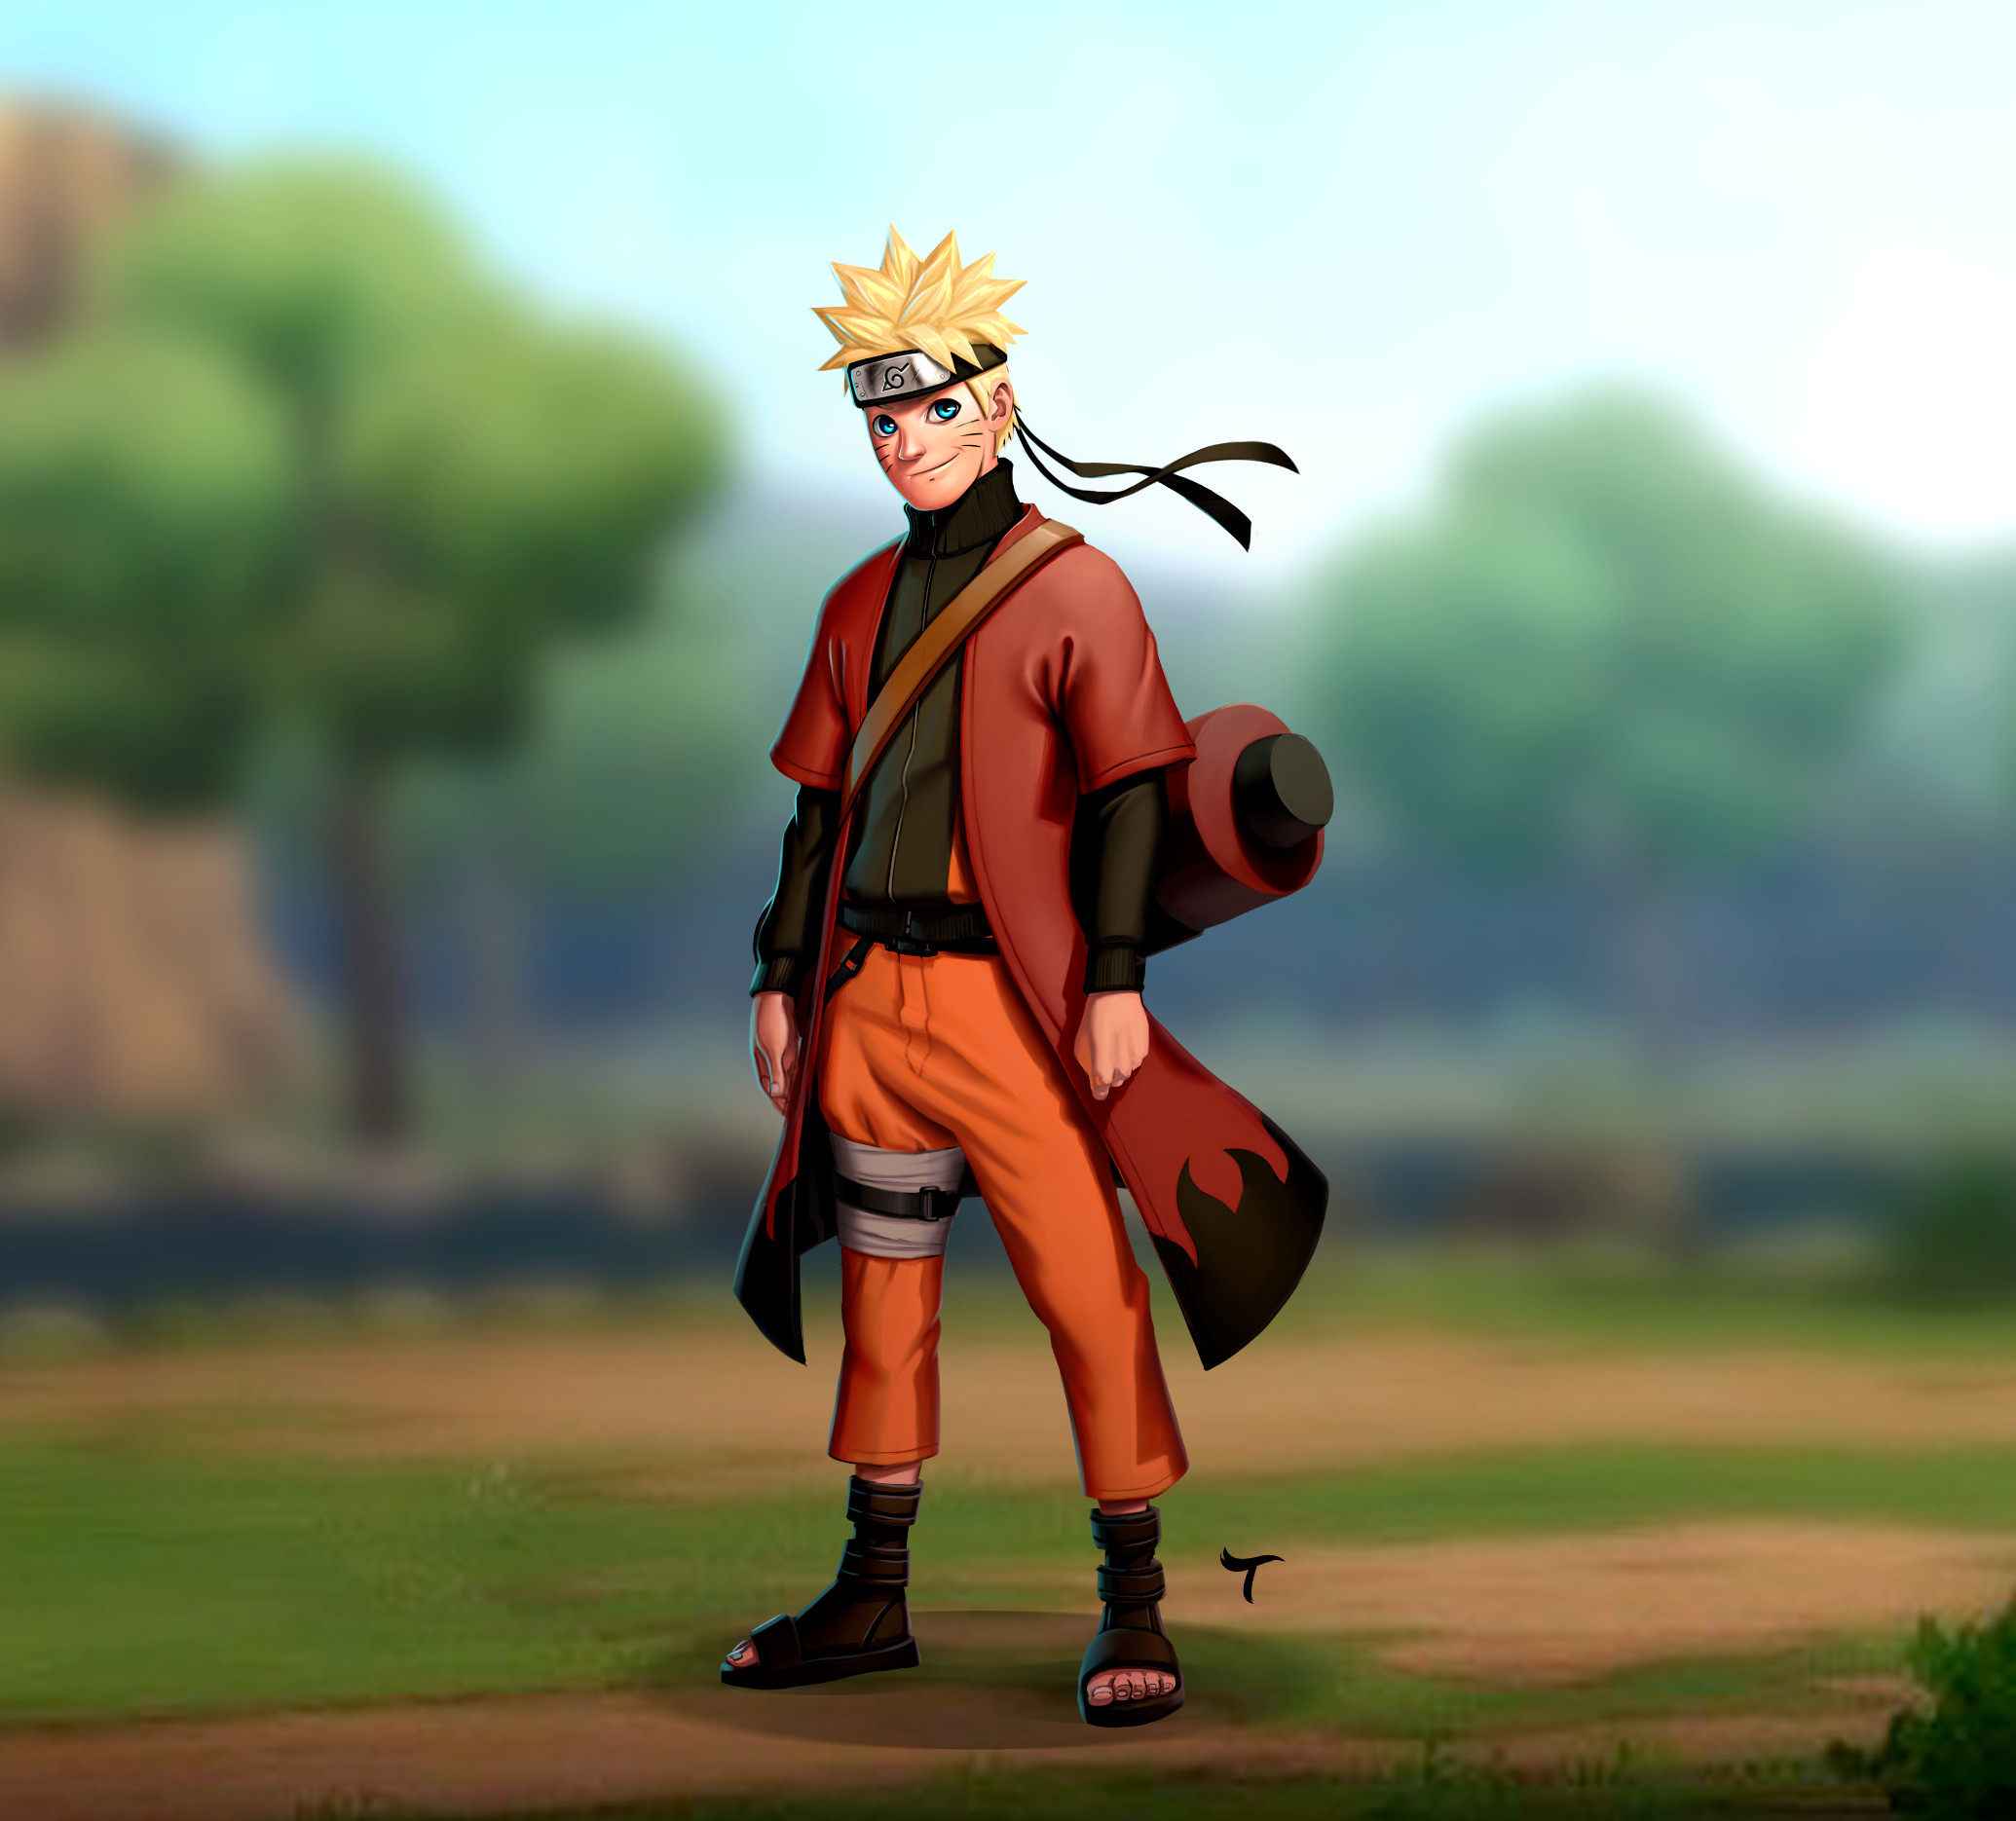 Naruto - Cartoon Realistic